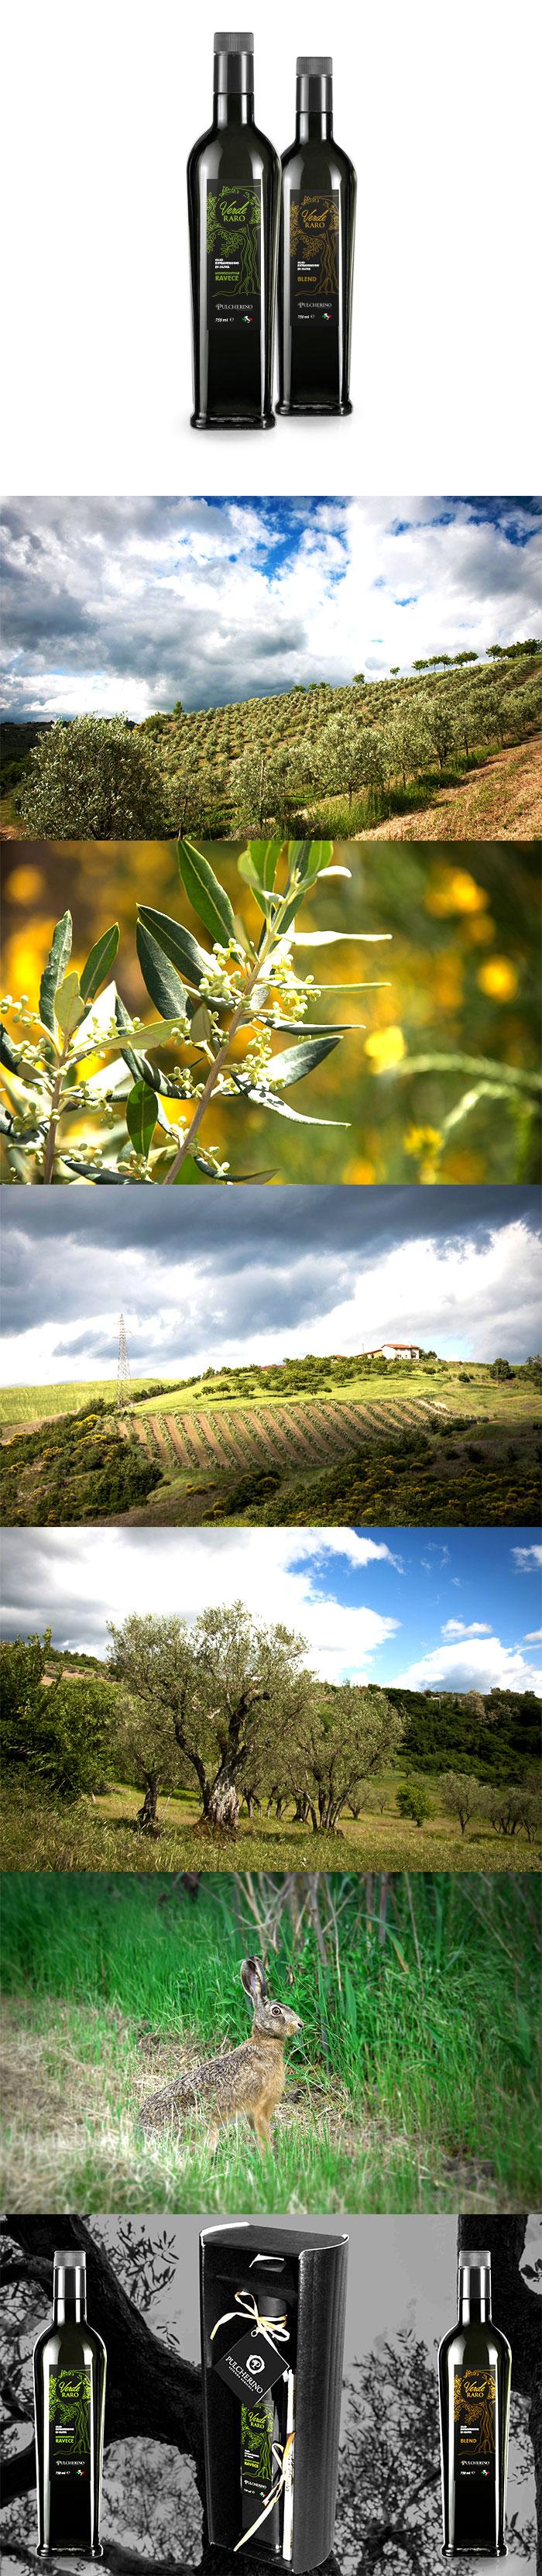 pulcherino-olio-verde-oro